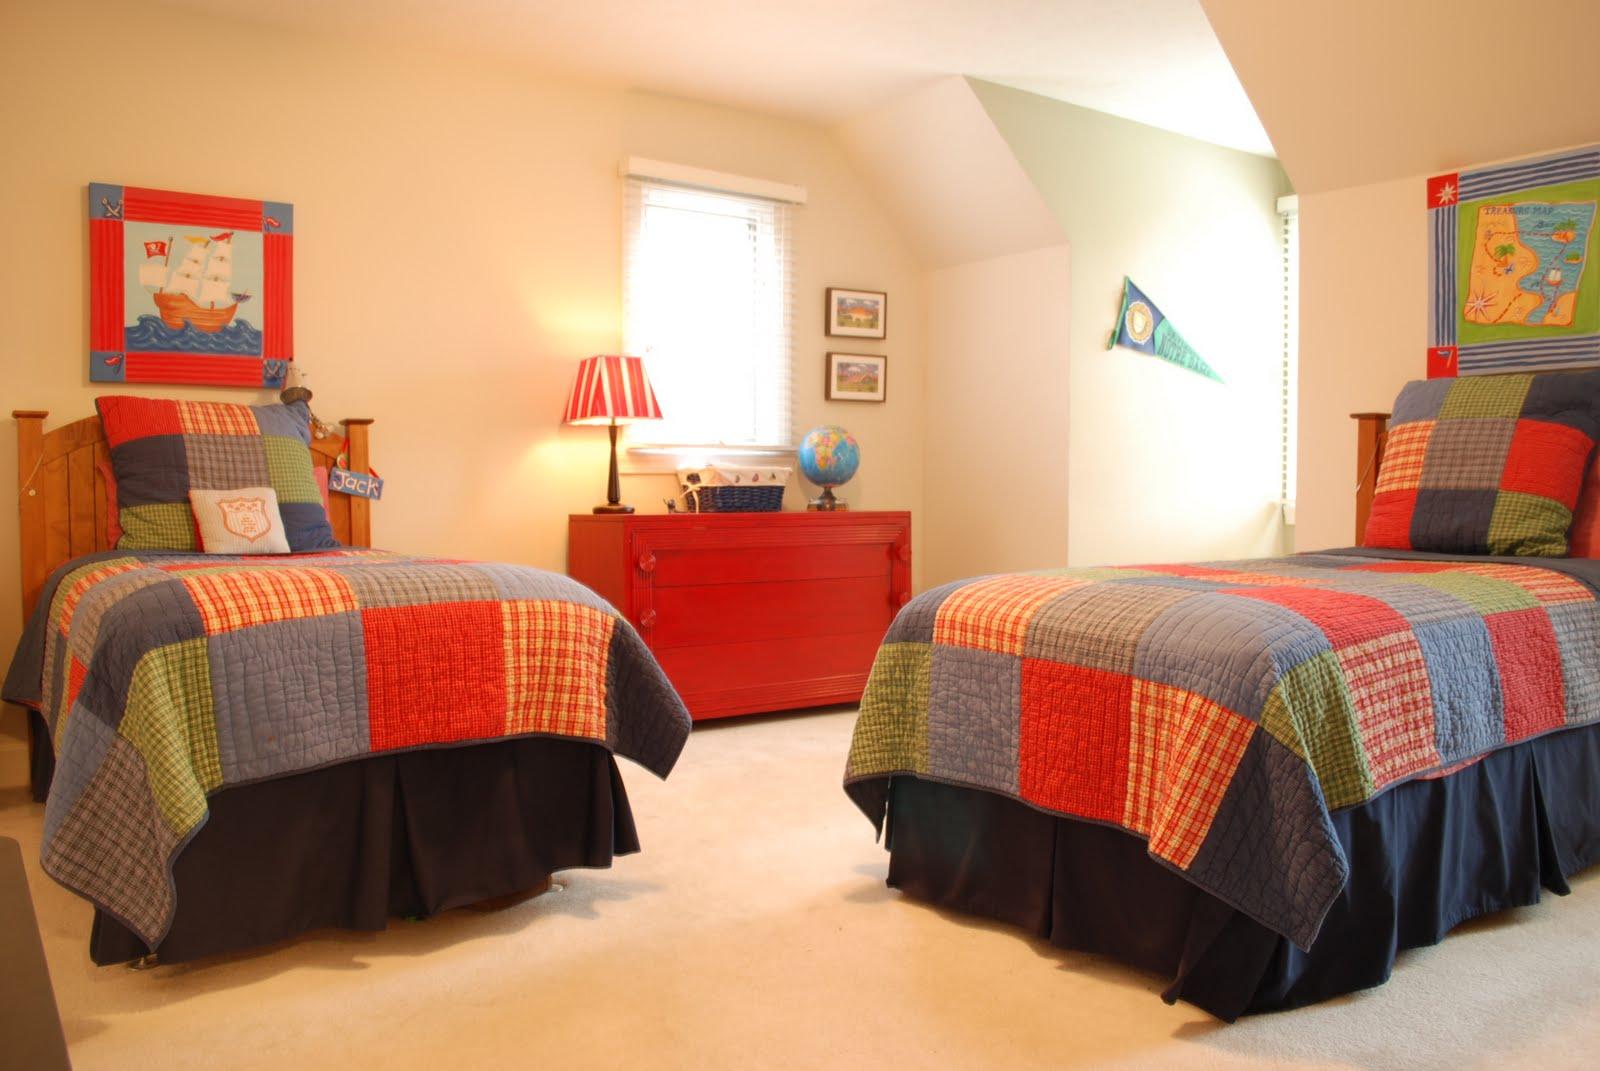 Twin Beds for Boys IKEA – HomesFeed